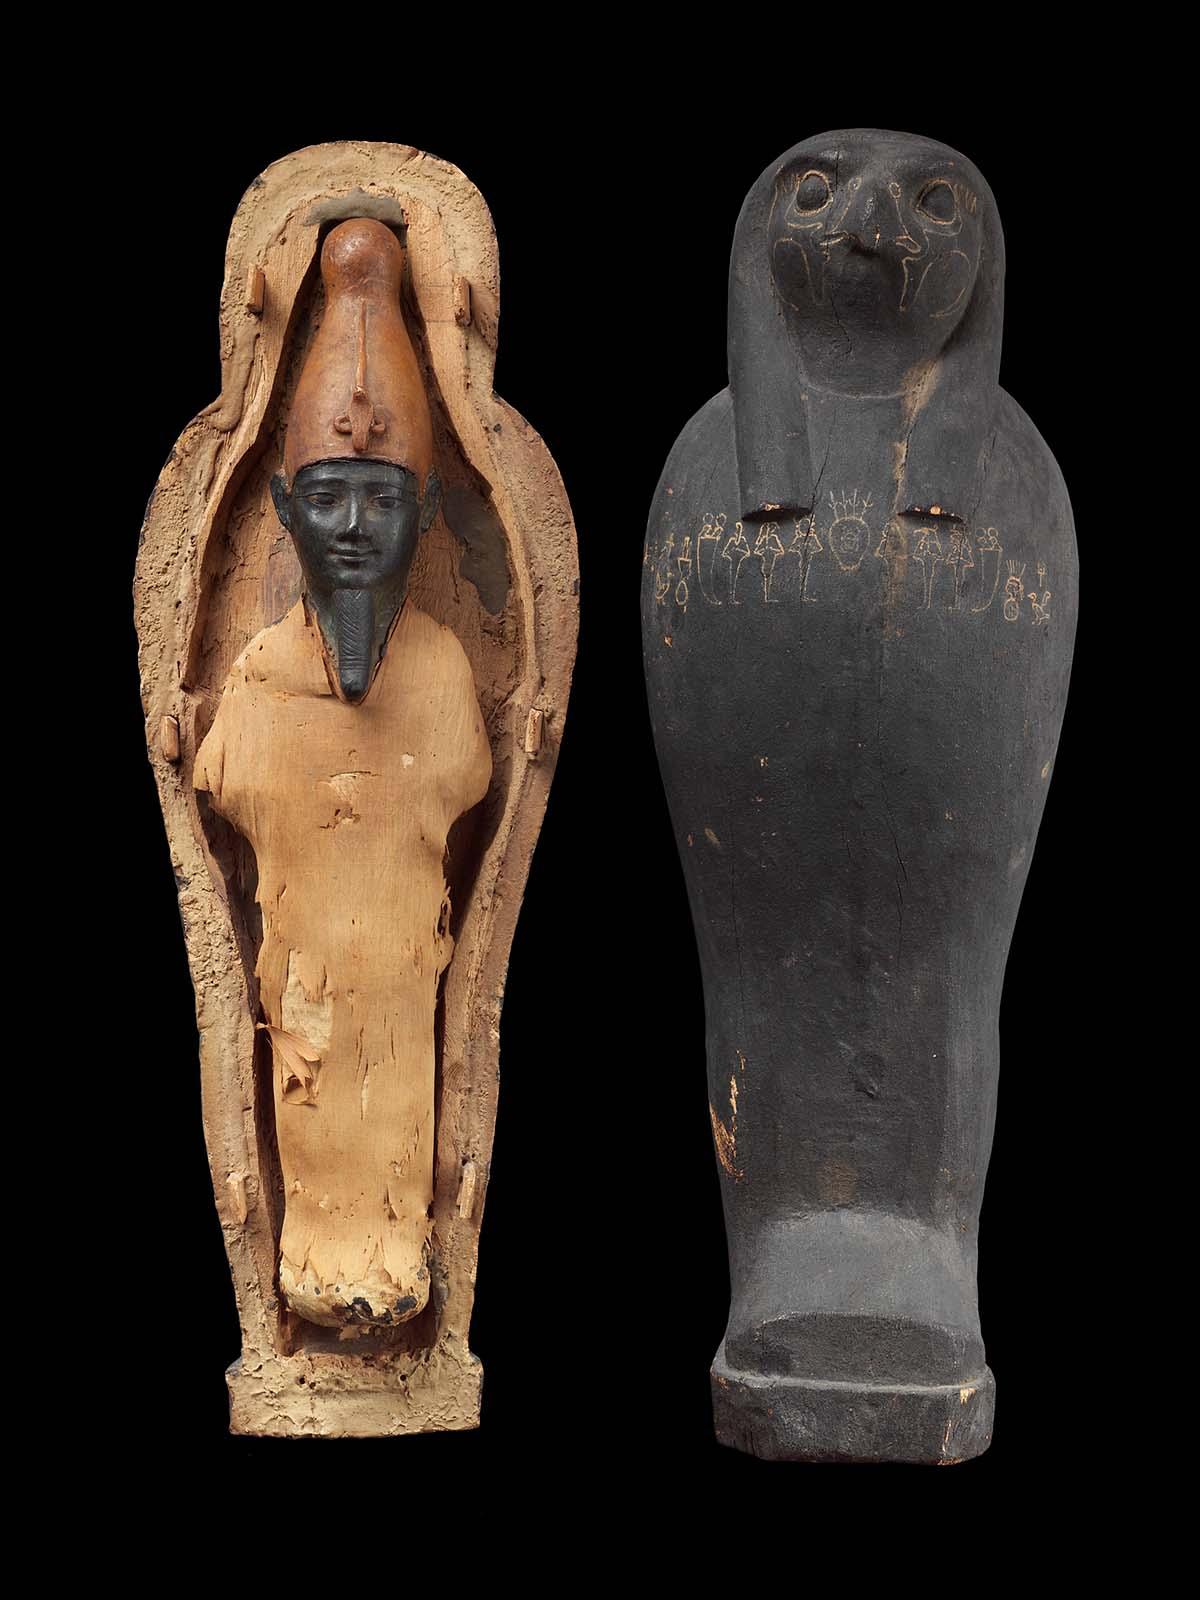 Coffin With Grain Mummy